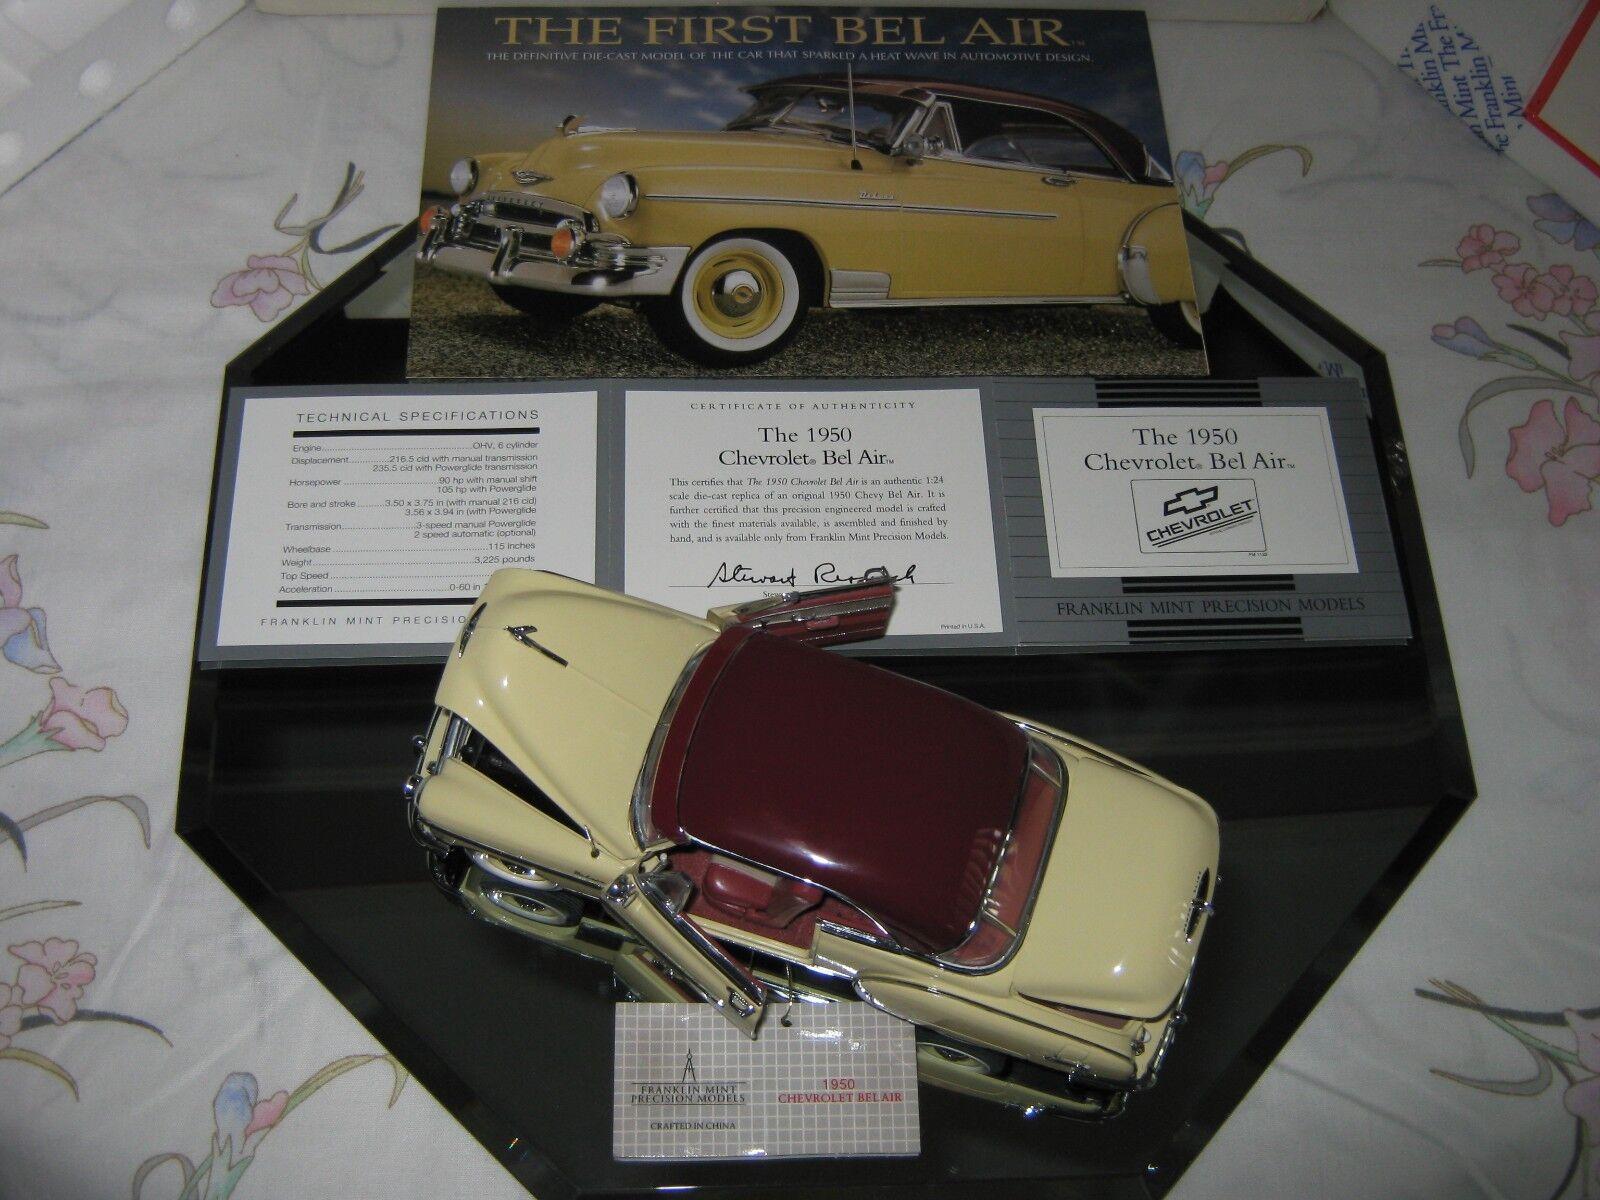 Franklin - mint - 1   24 1950 chevrolet bel air styleline deluxe